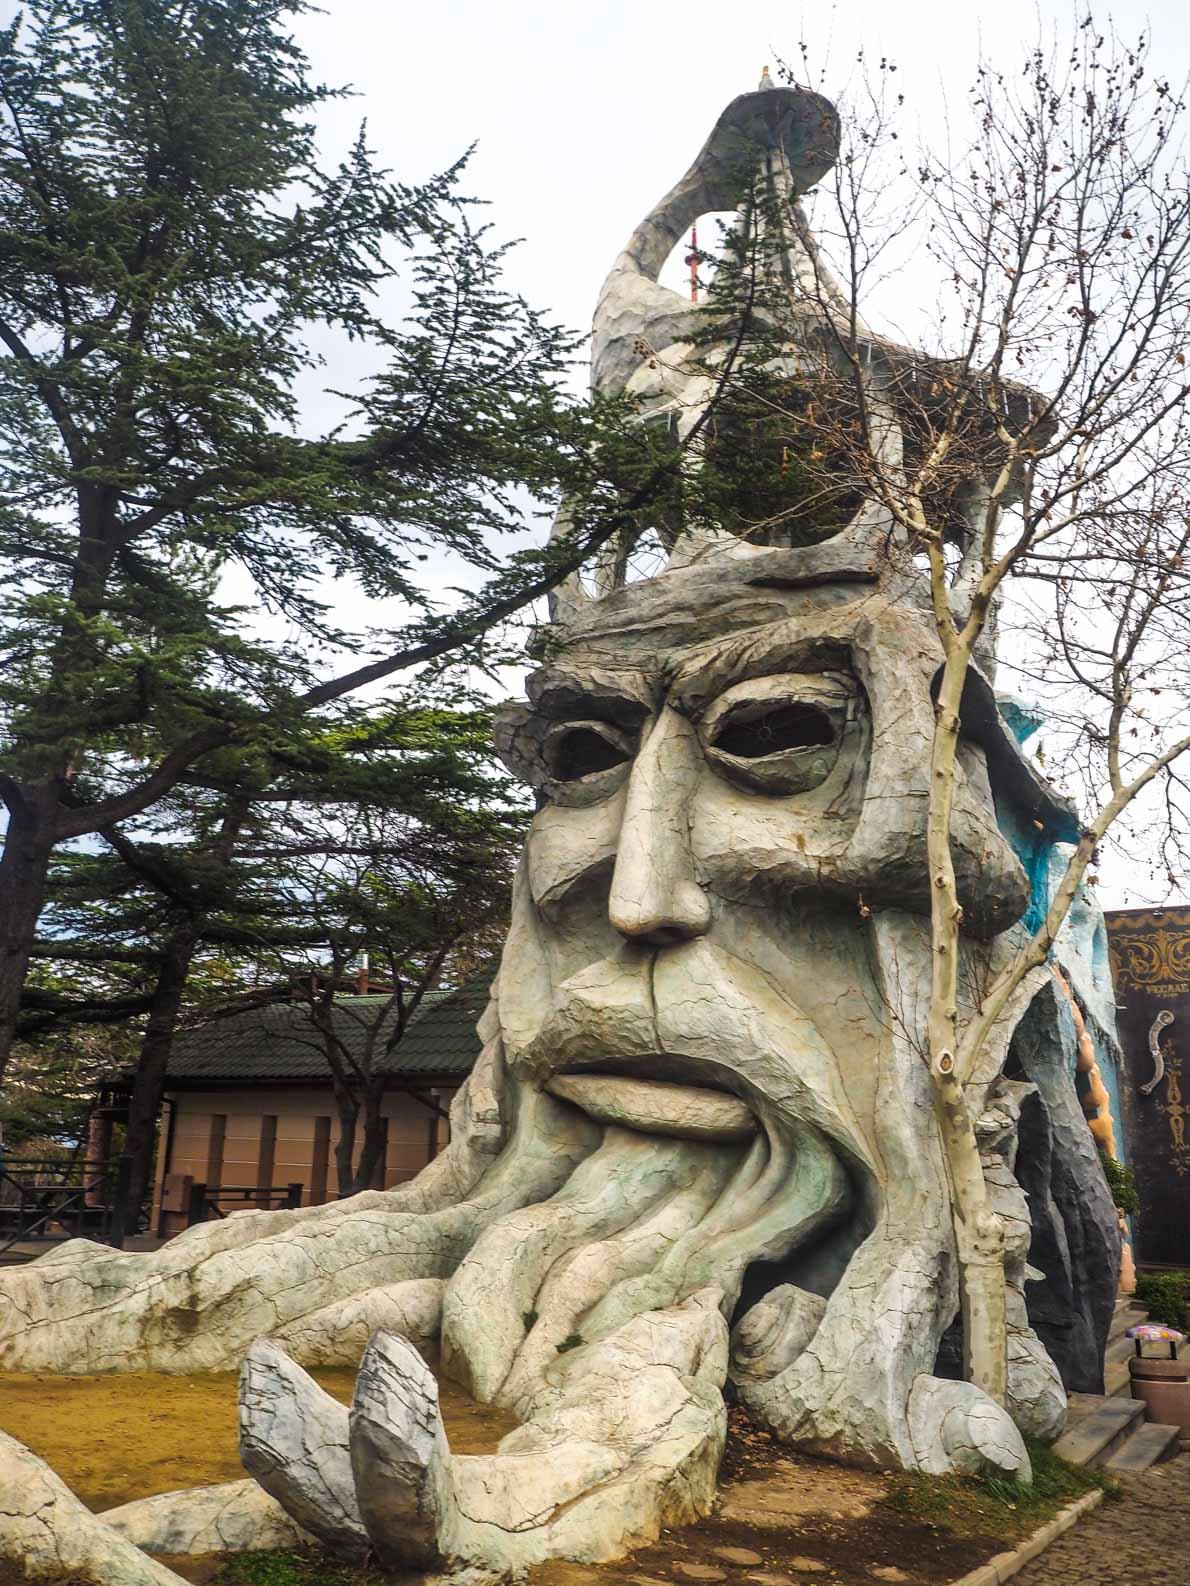 Strange art in Tbilisi Georgia